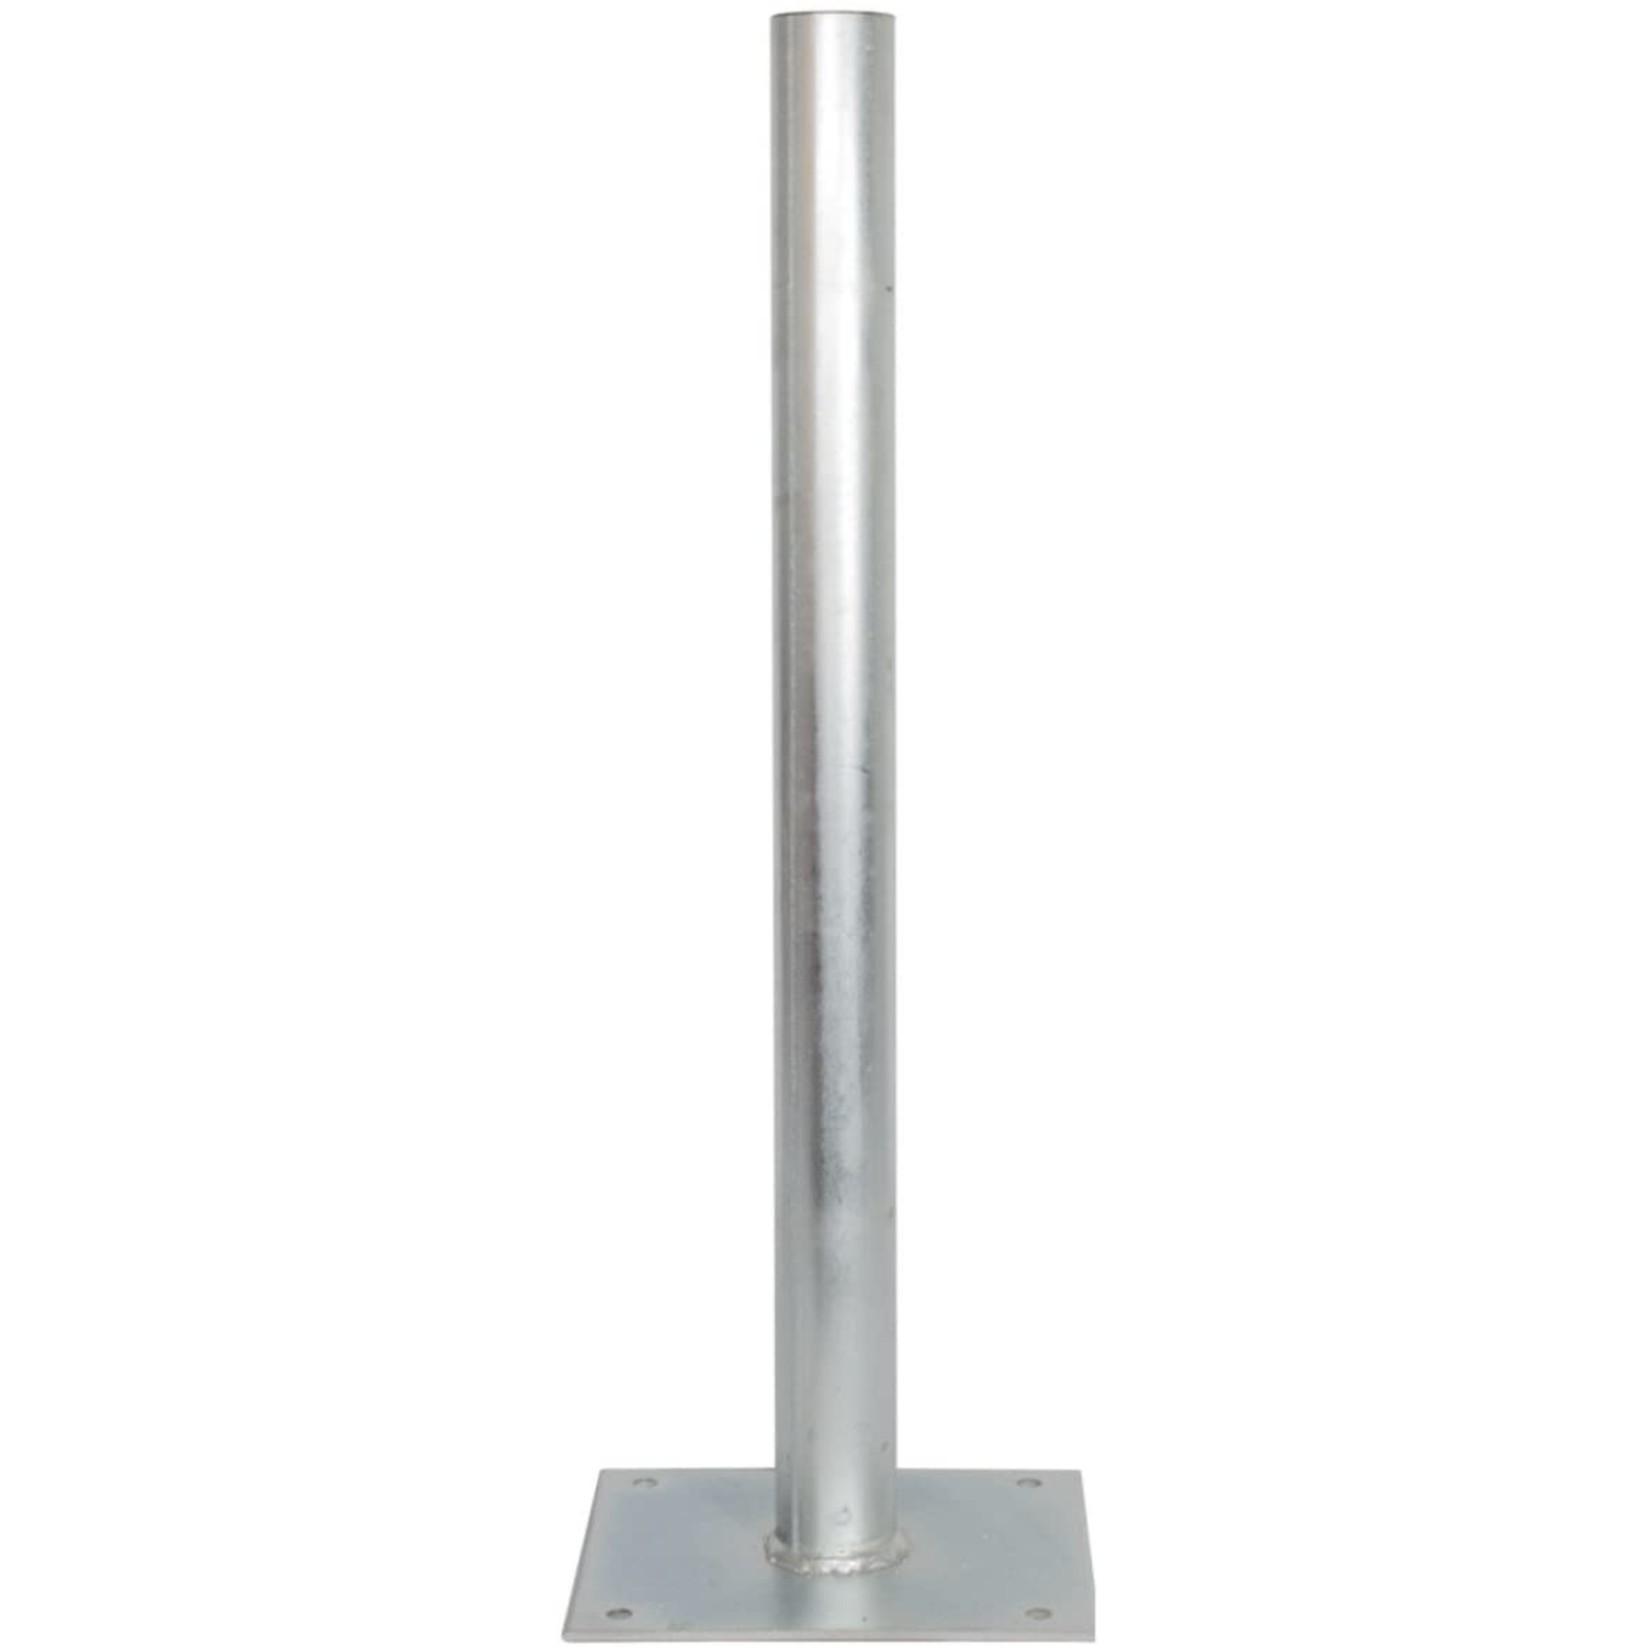 DEFISAT GRONDBEVESTIGING MET MAST 48 mm dia - 1 VOET 30x30 cm